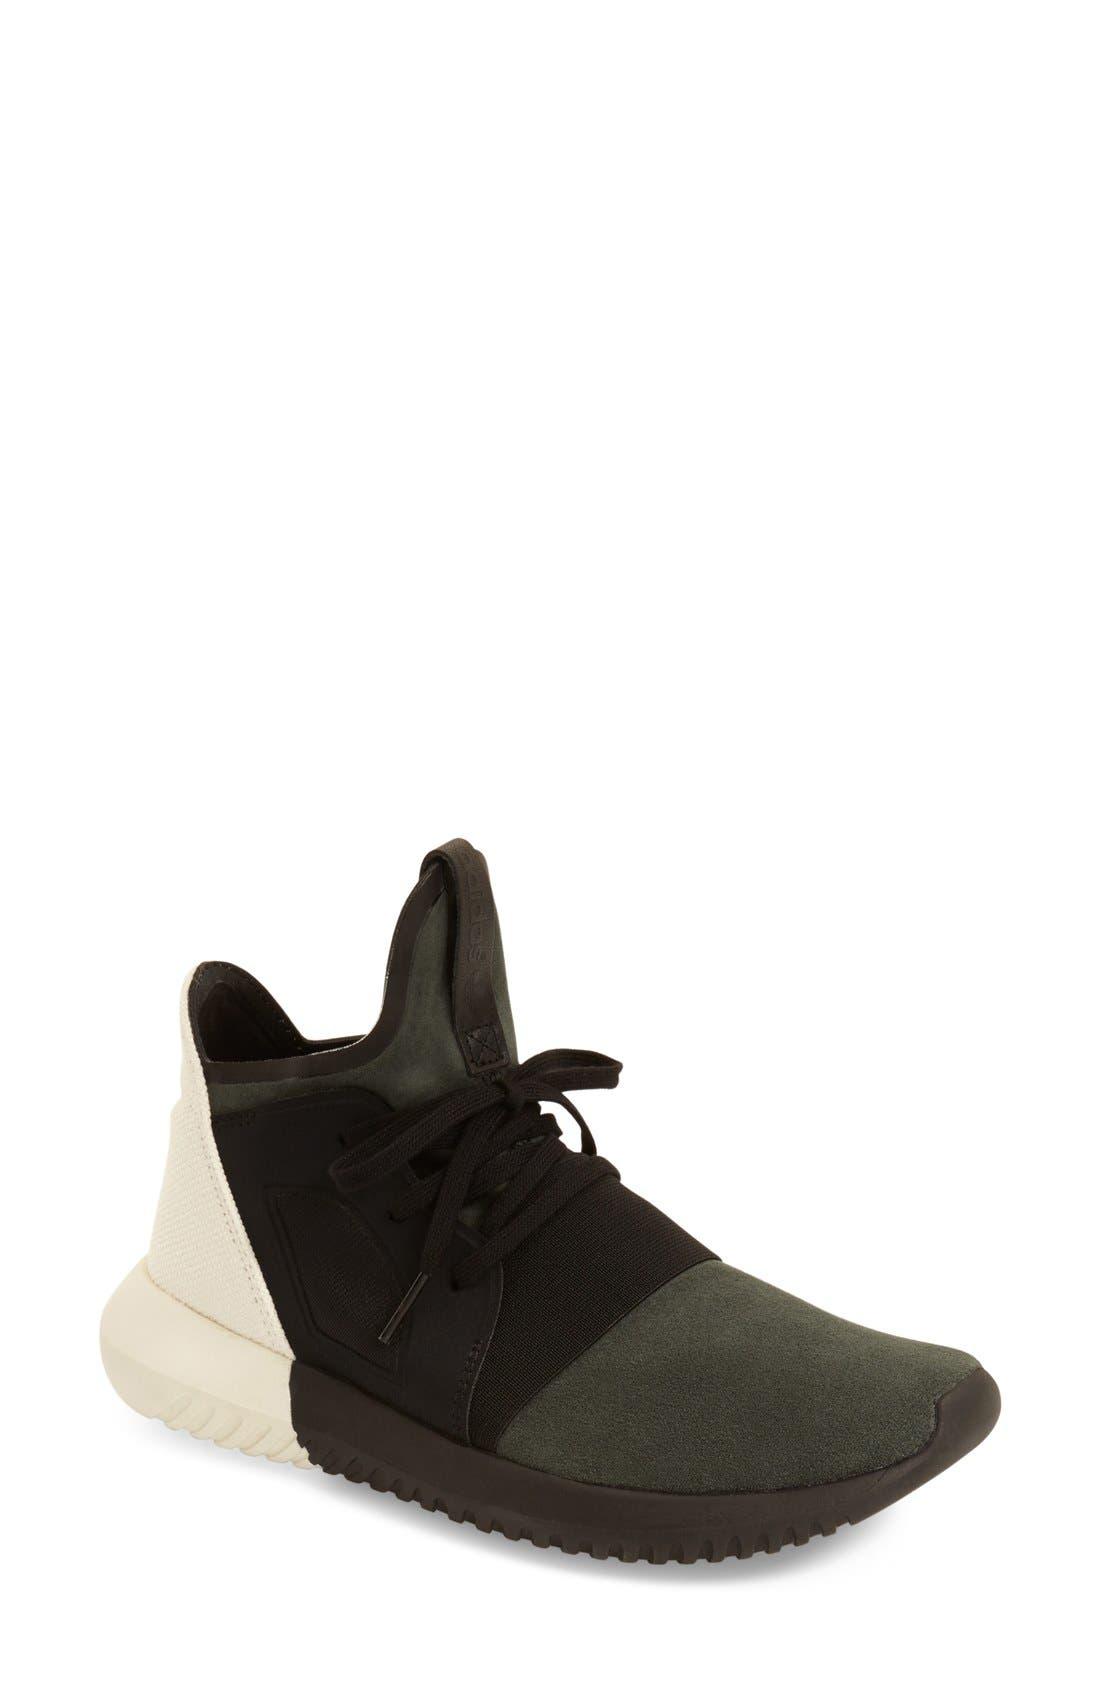 Tubular Defiant Sneaker,                             Main thumbnail 1, color,                             001